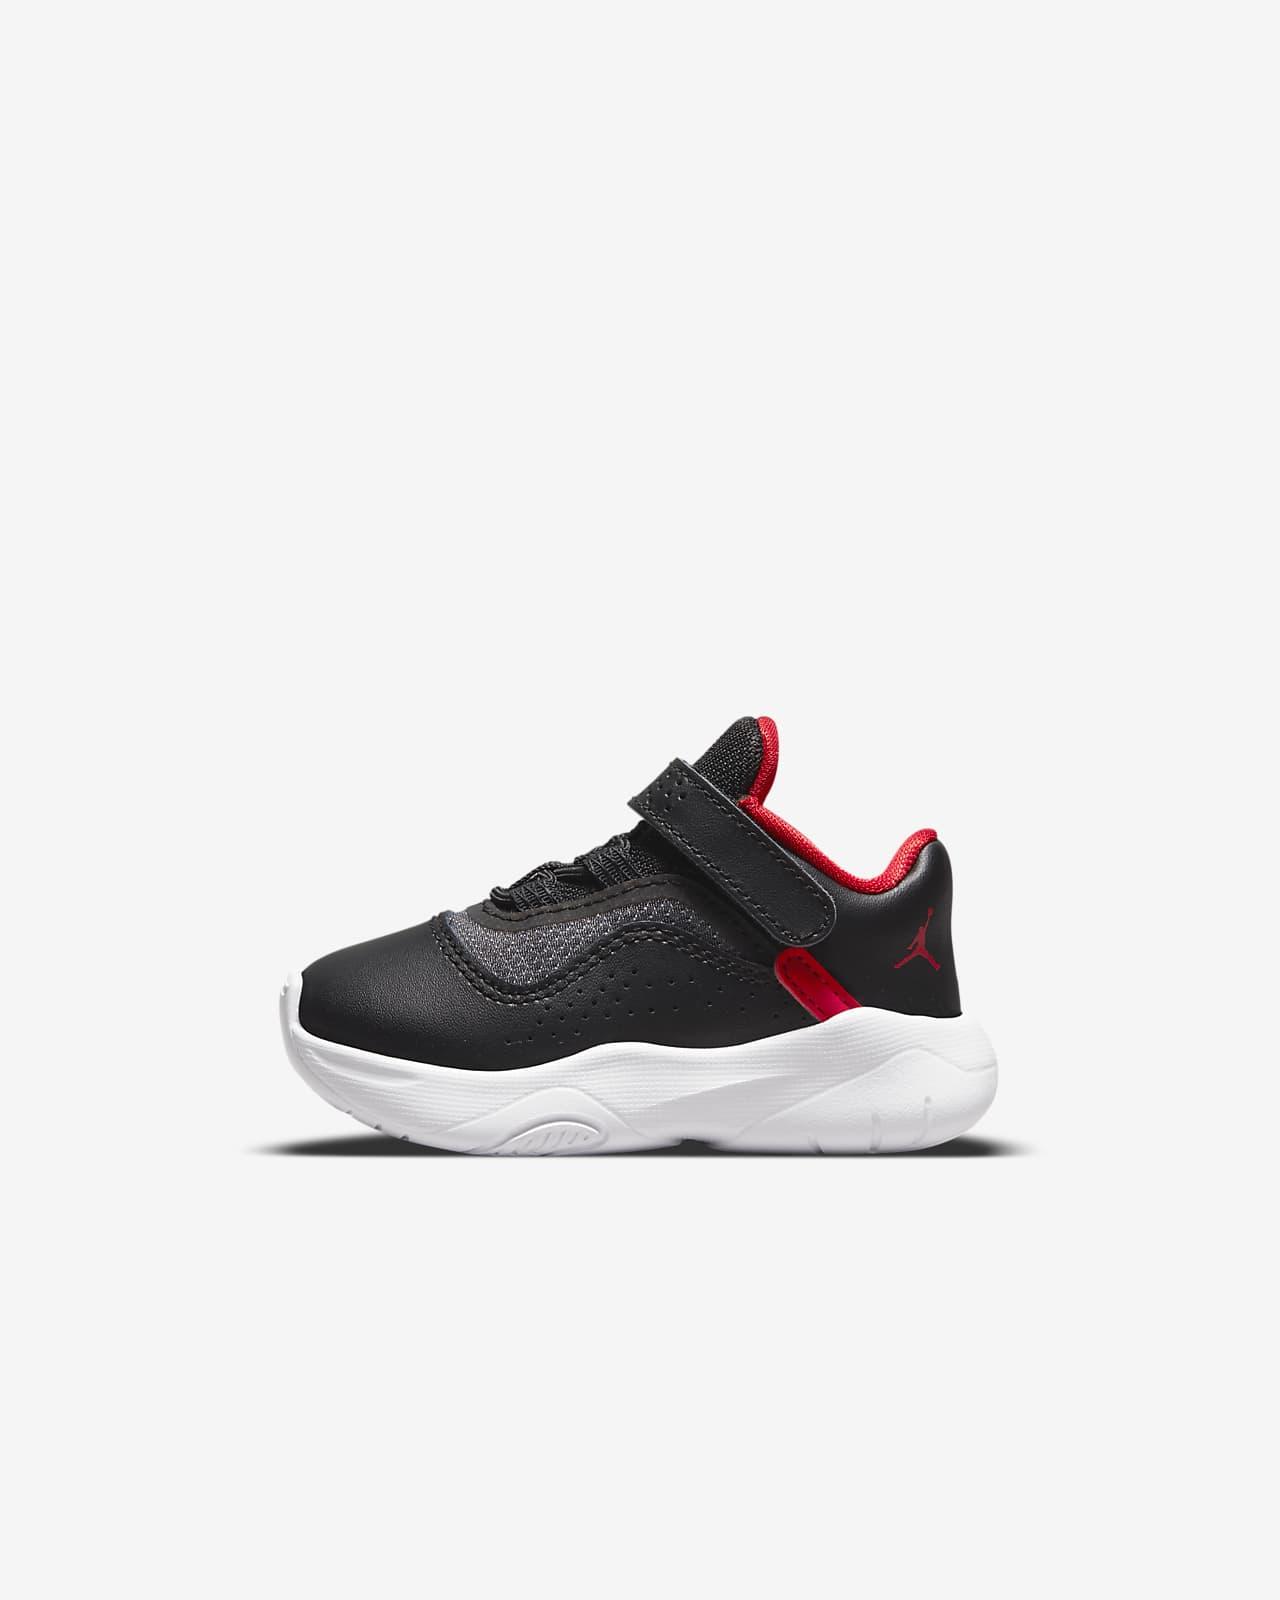 Jordan 11 CMFT Low Baby & Toddler Shoe